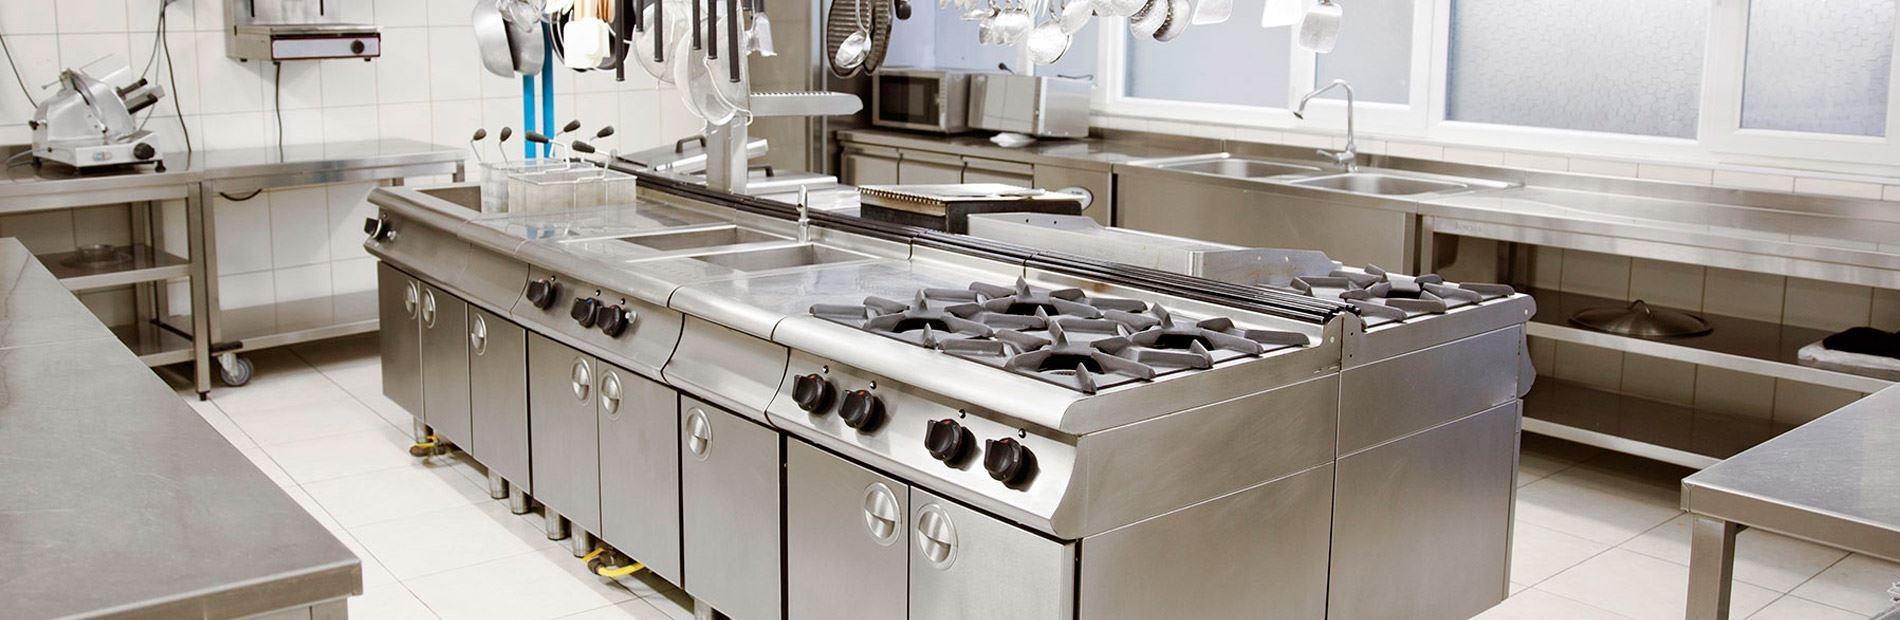 maquinaria para hosteleria equipos para cocinas de hosteleria